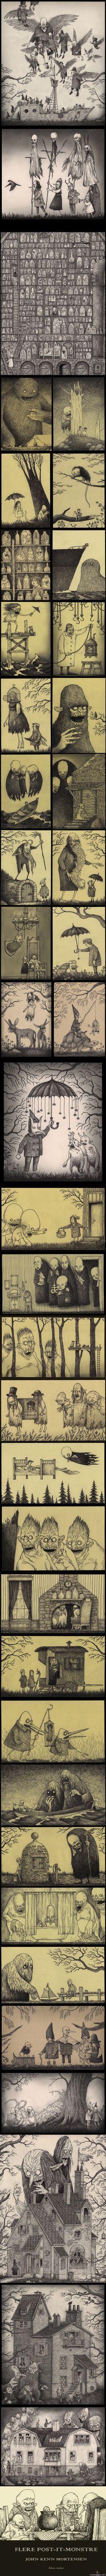 john kenn mortensen drawings on post-its